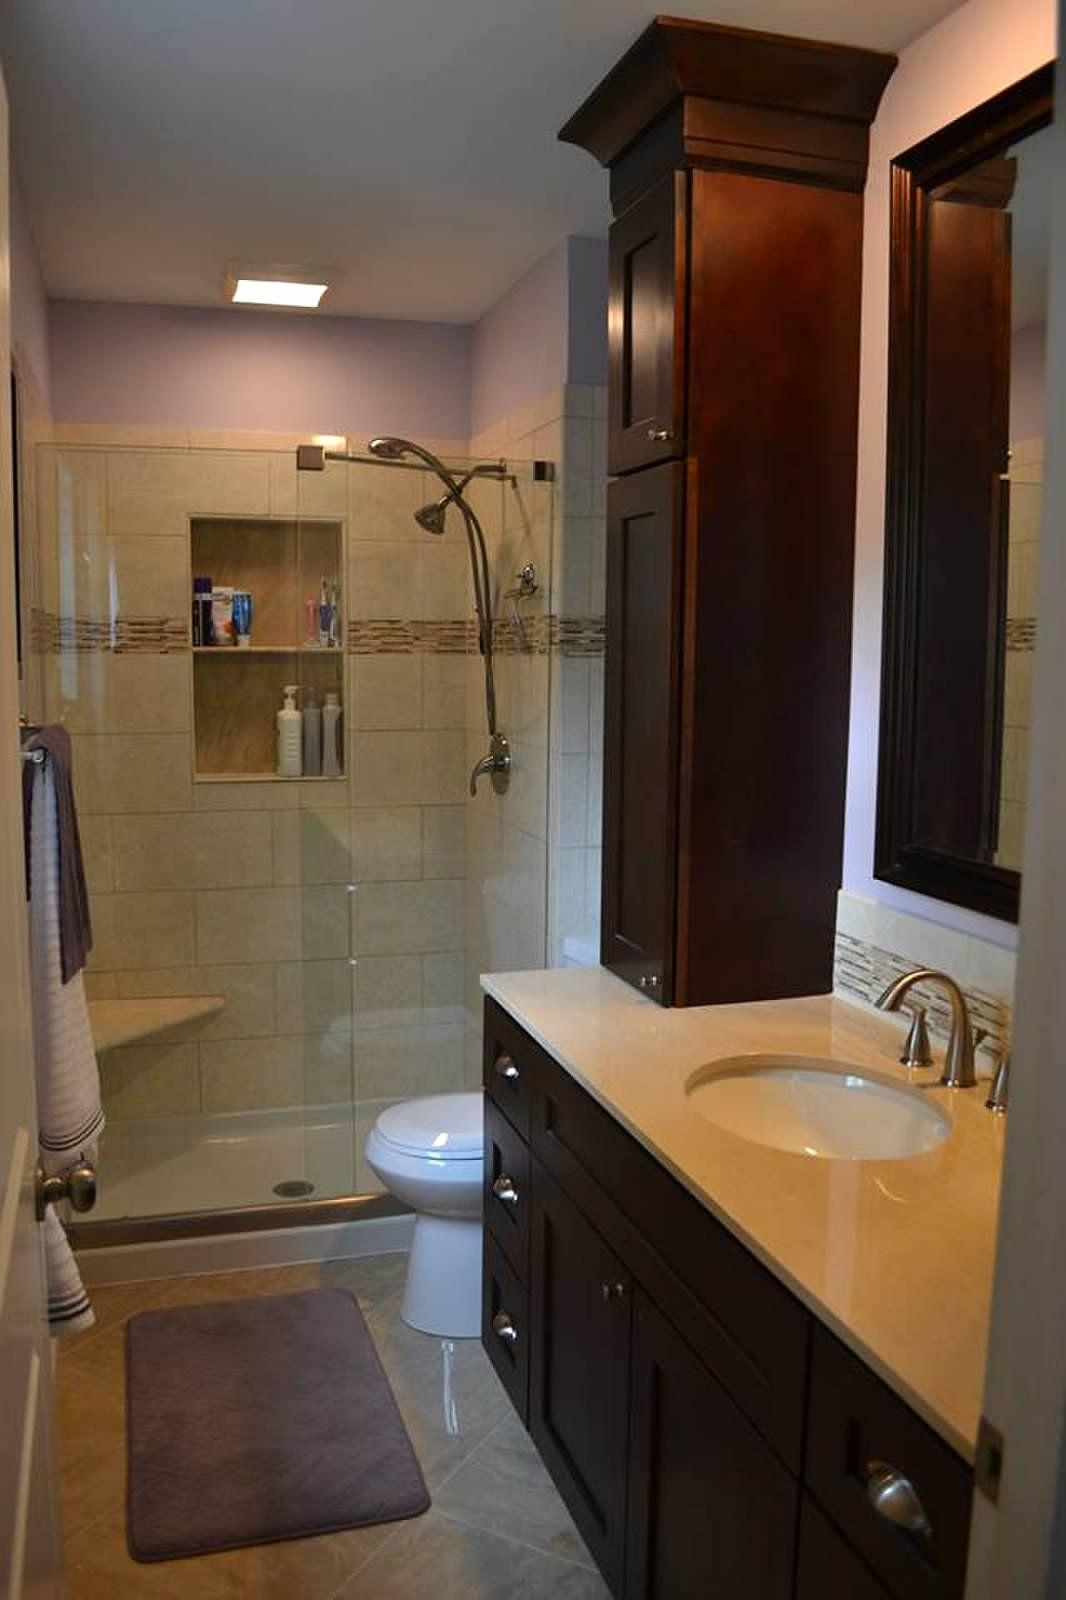 Pin by Jenn D on Bathrooms | Master bathroom renovation ...